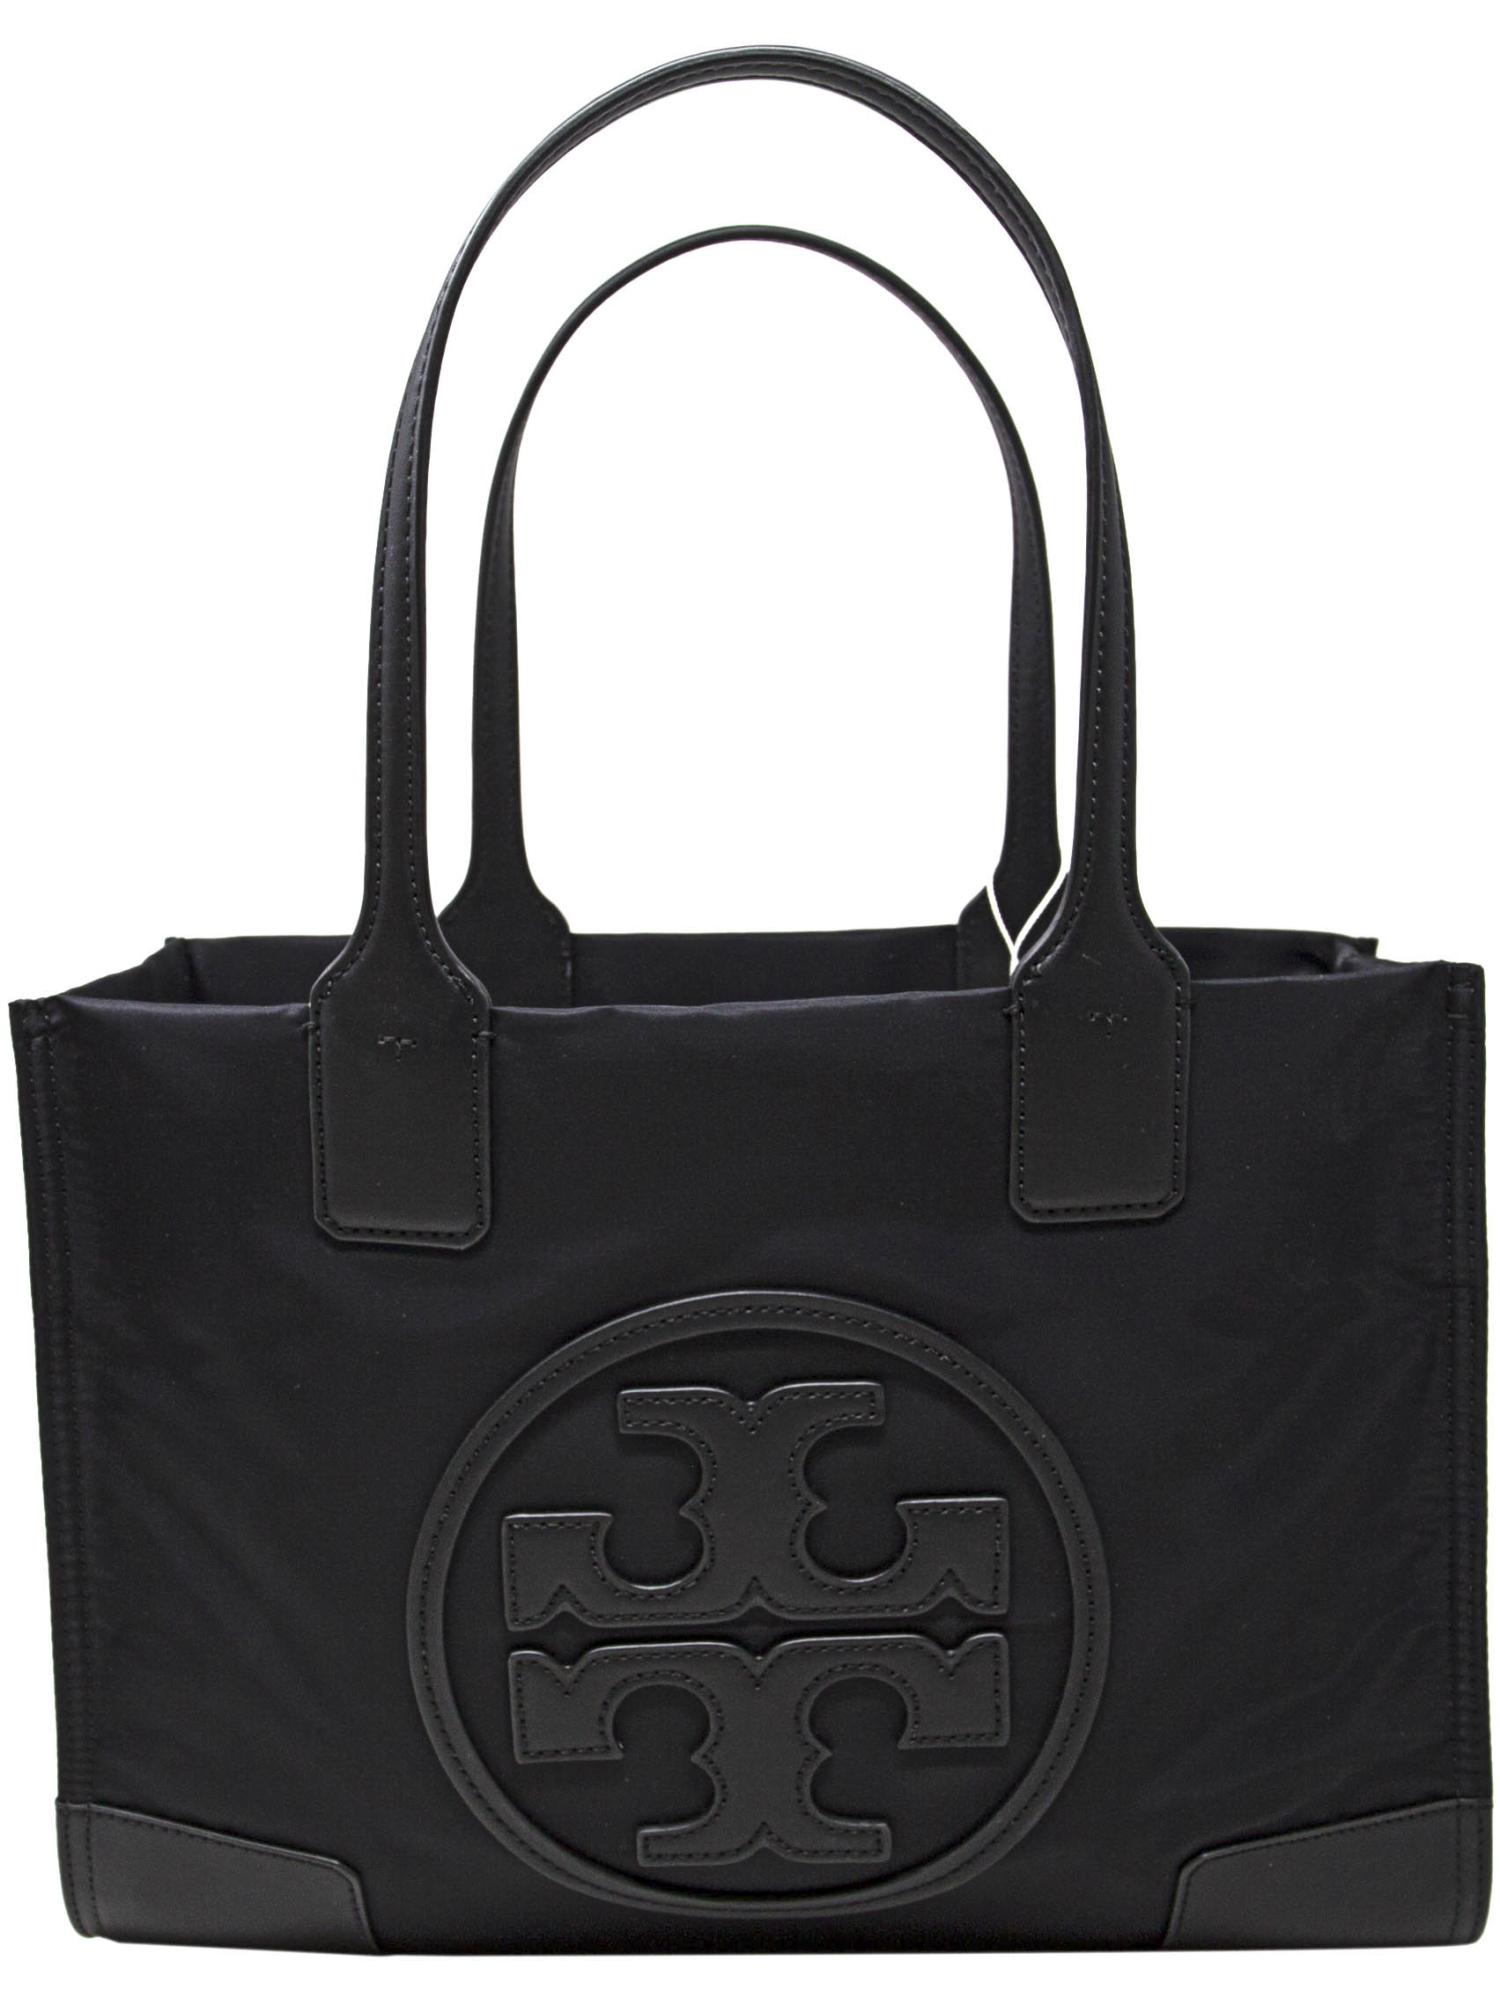 55b75f6d6e73 Tory Burch Women s Mini Ella Nylon Top-Handle Bag Tote